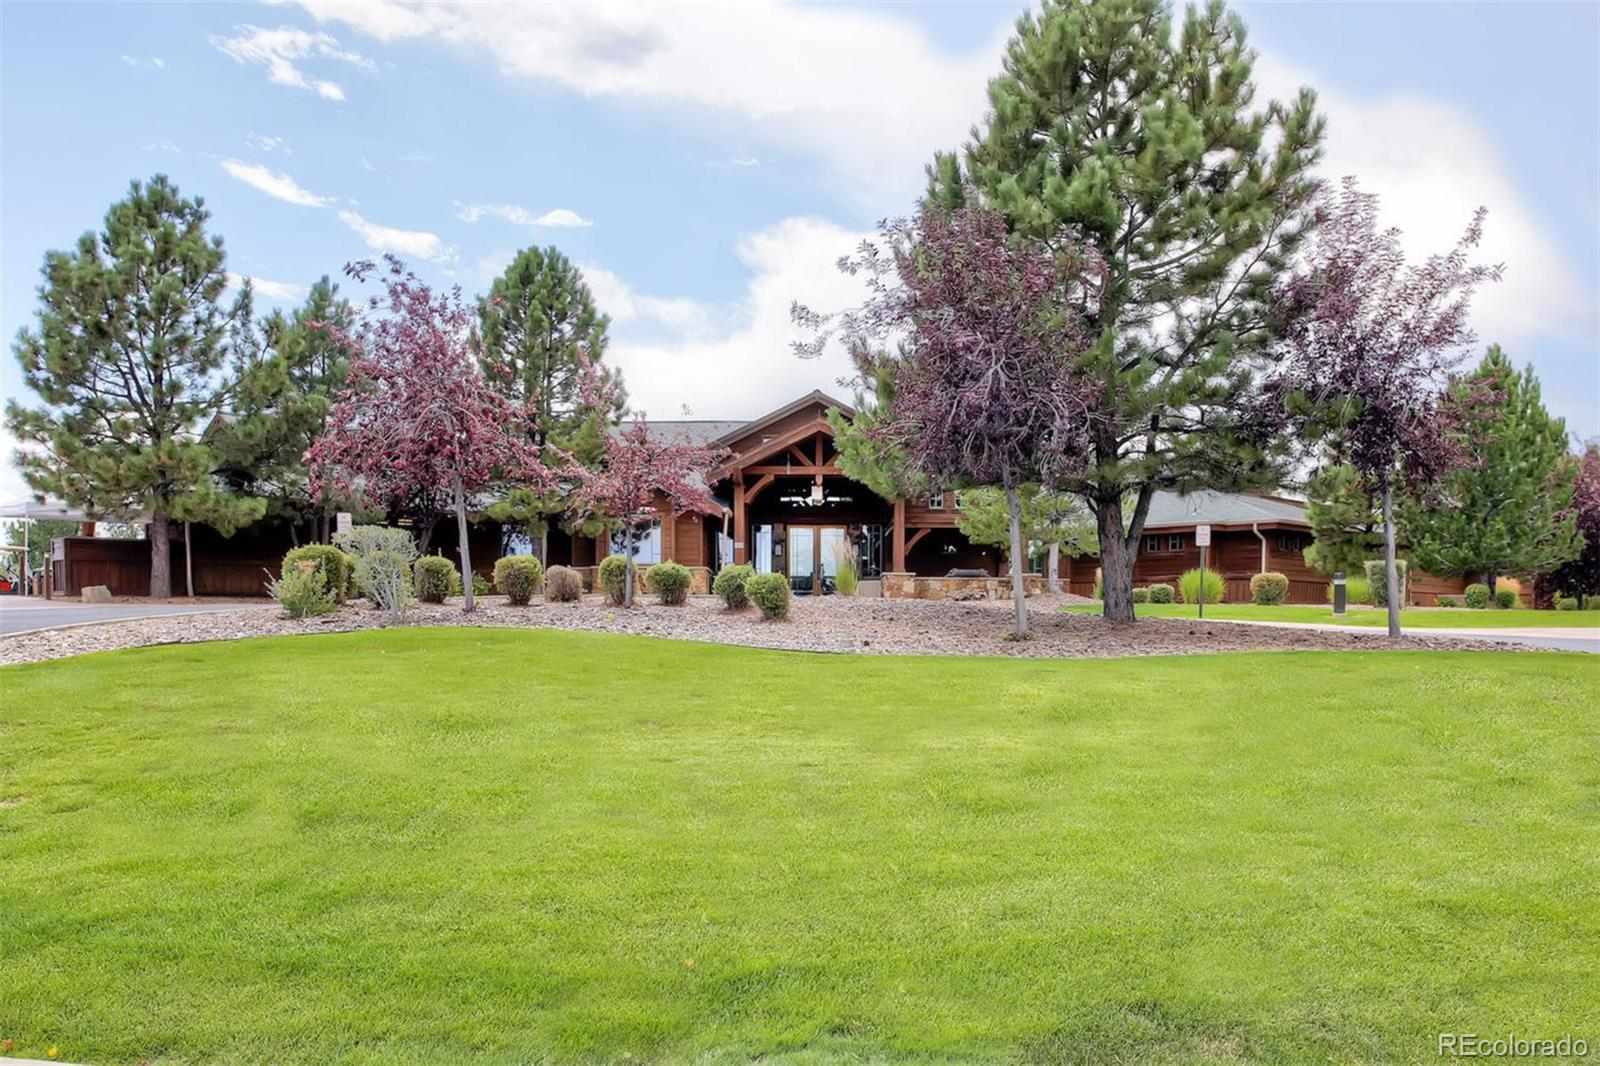 MLS# 8392036 - 35 - 8399 Winter Berry Drive, Castle Pines, CO 80108